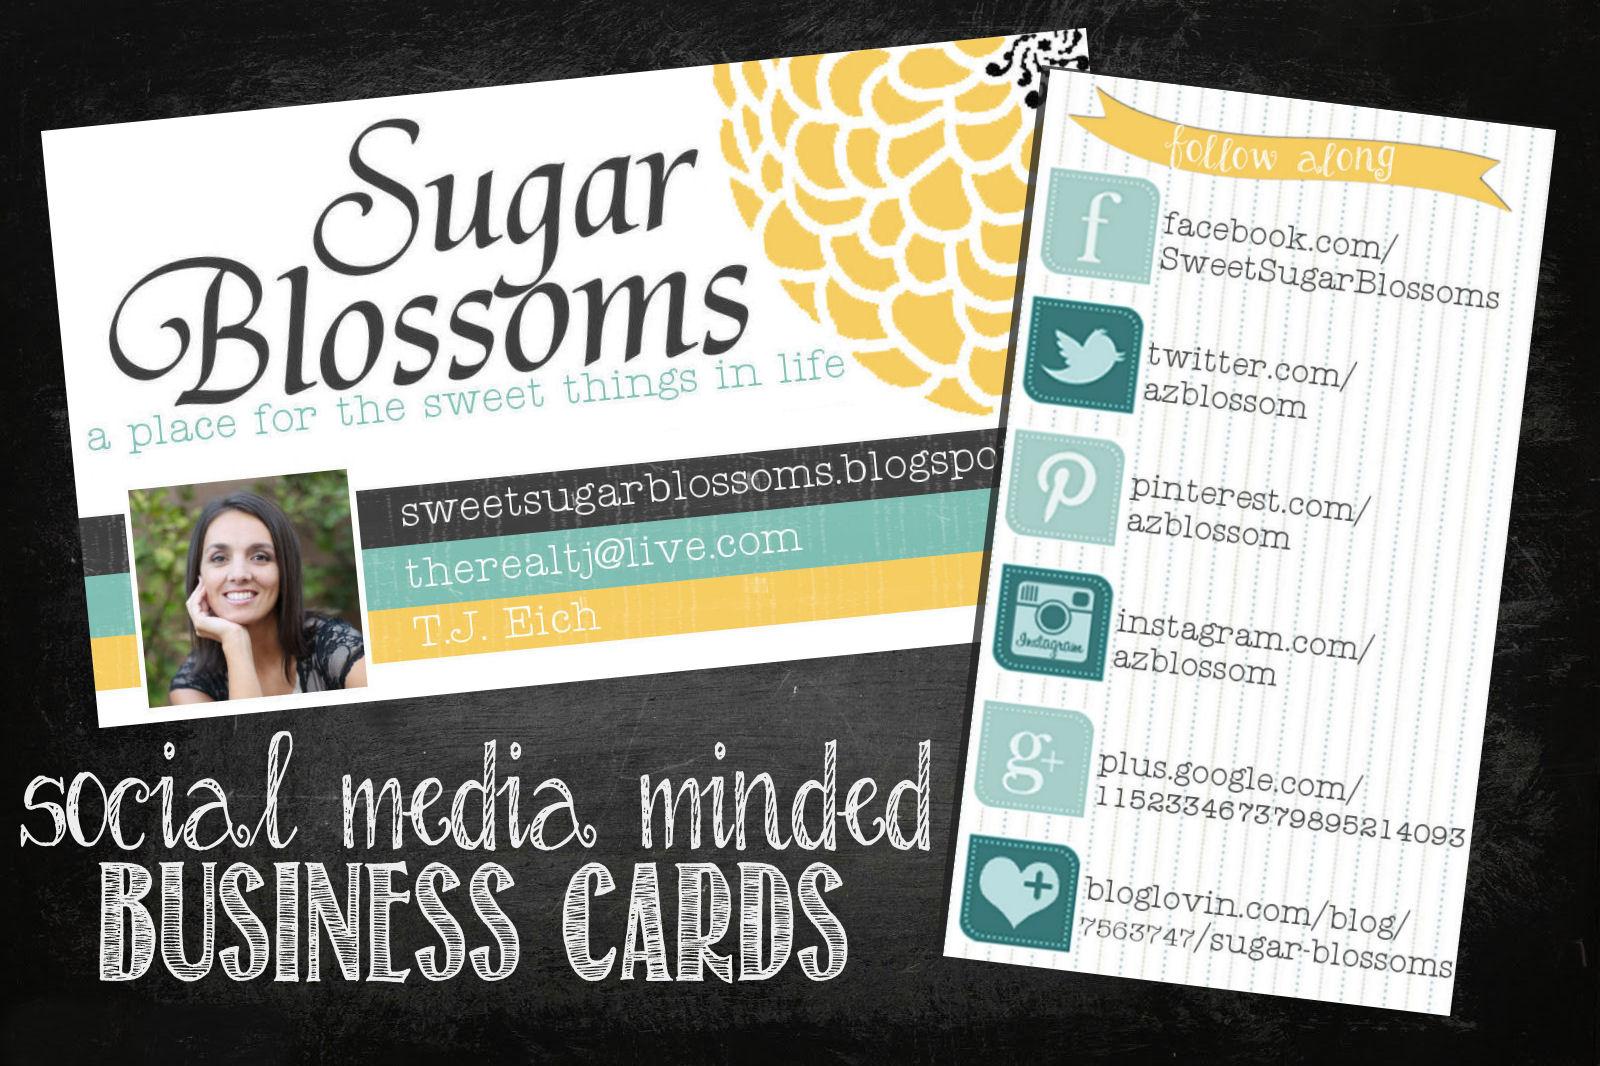 Sugar Blossoms Social Media Business Cards